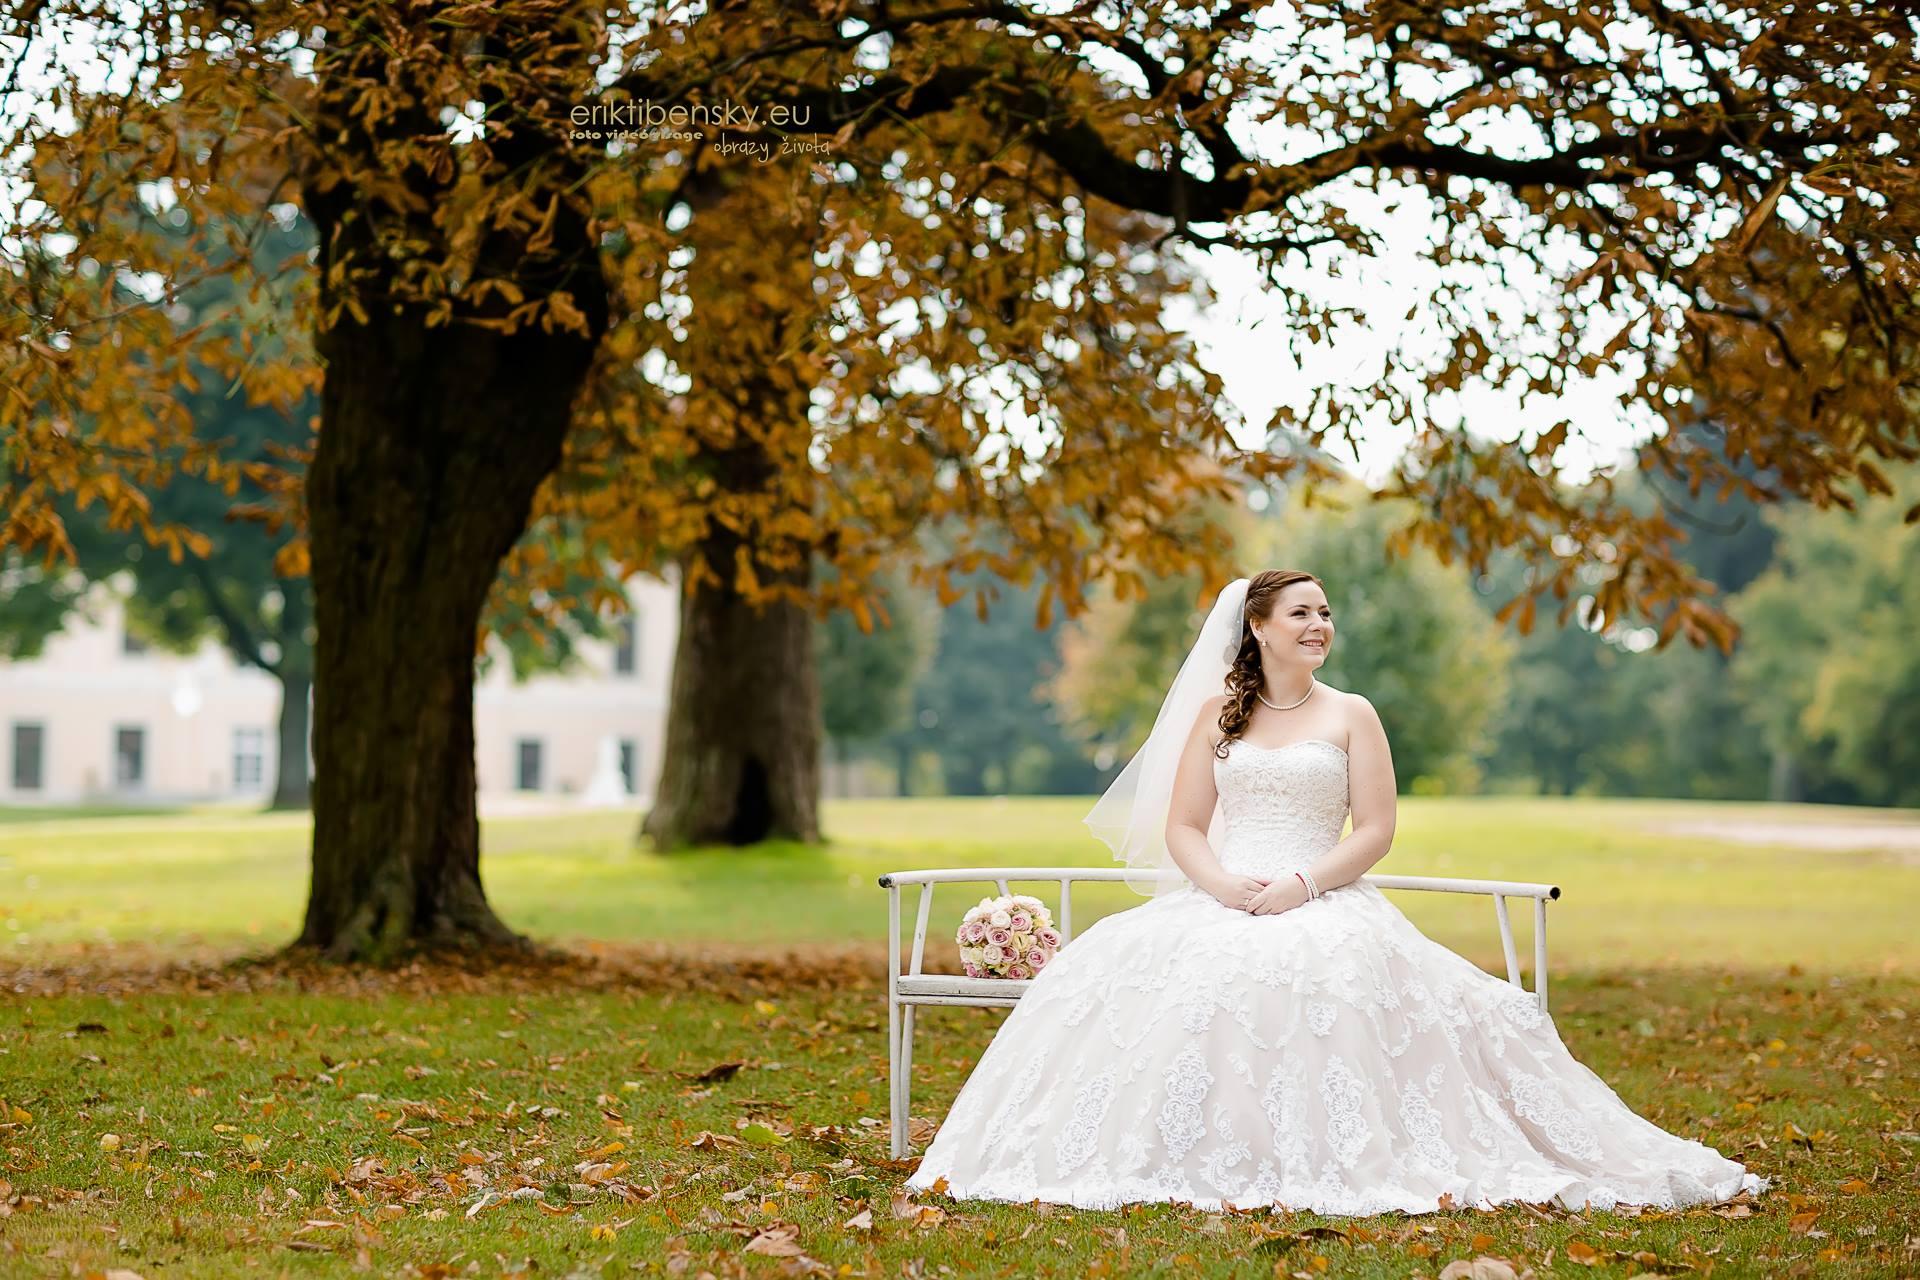 eriktibensky-eu-svadobny-fotograf-wedding-photographer-3083